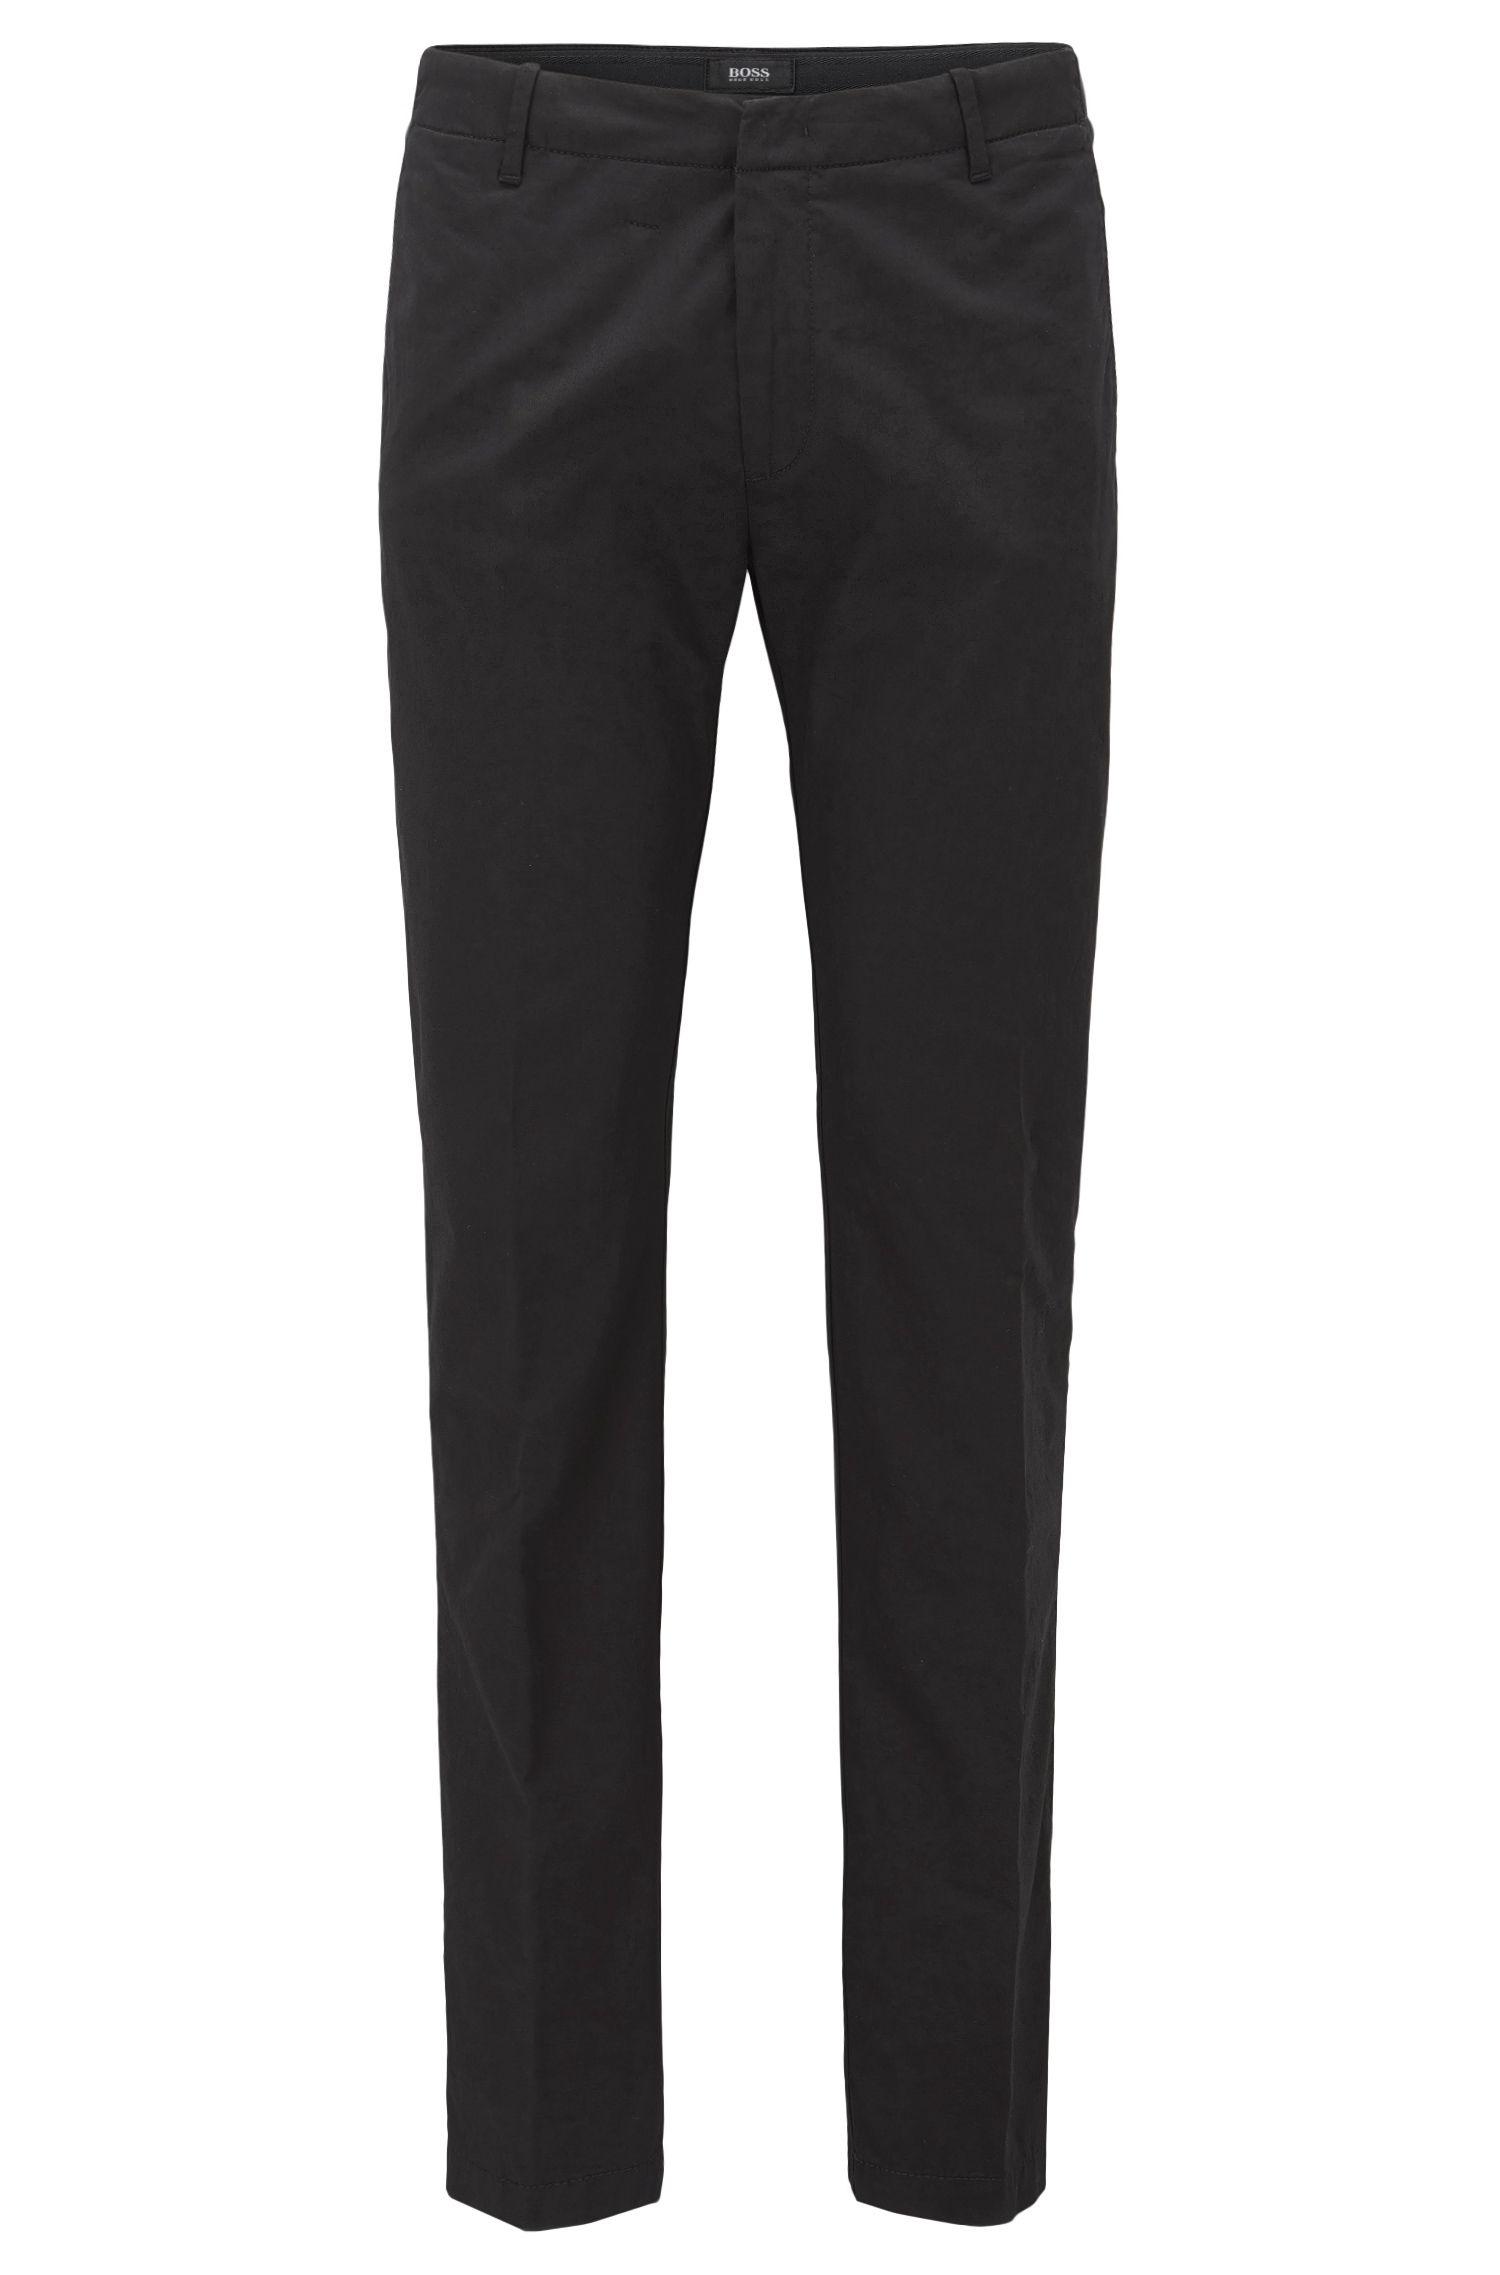 Slim-fit trousers in mercerised stretch cotton